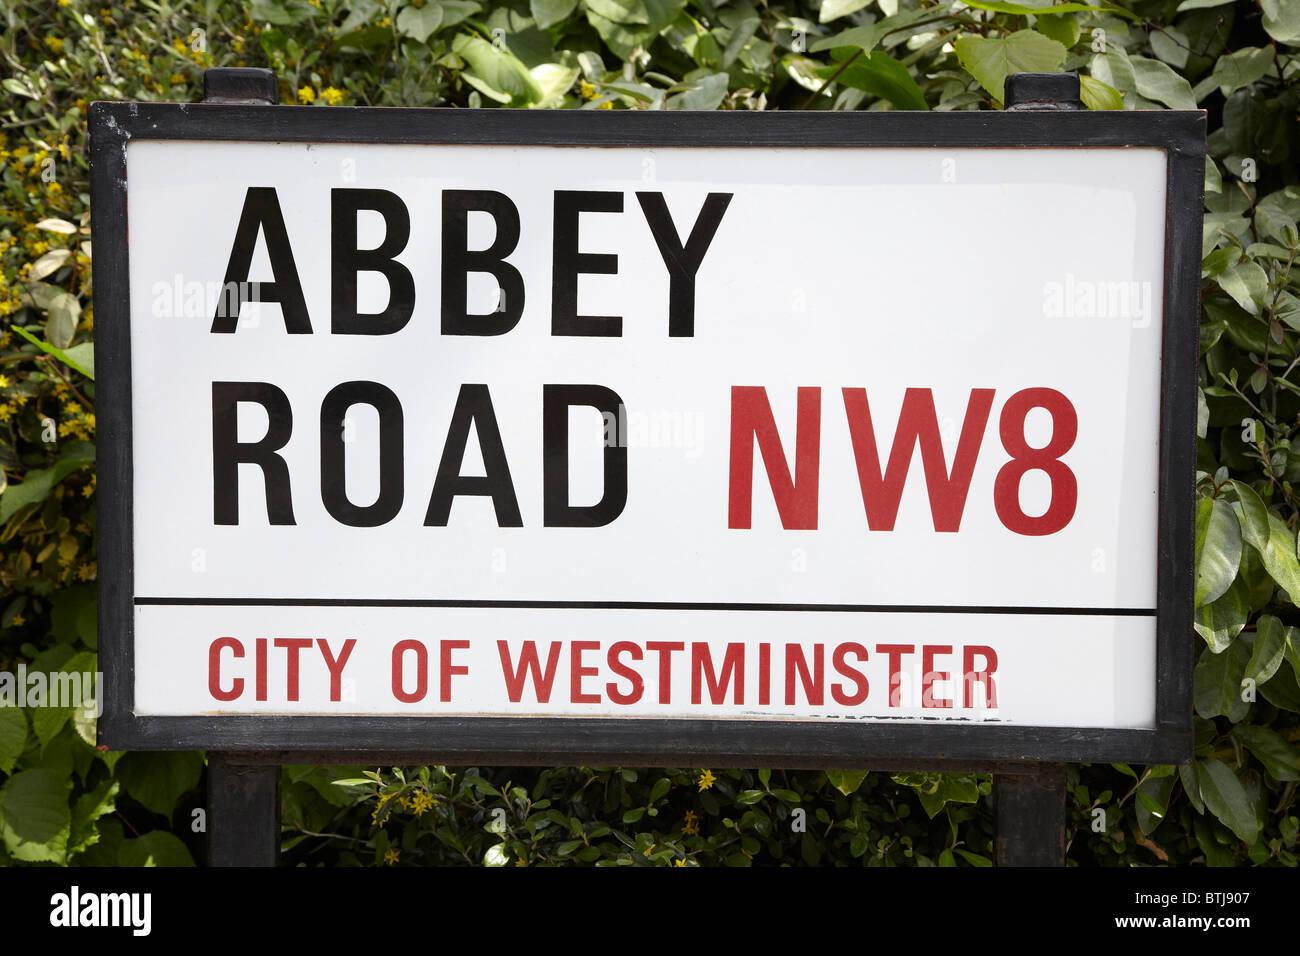 Abbey Road Sign, London, England, United Kingdom Stock Photo